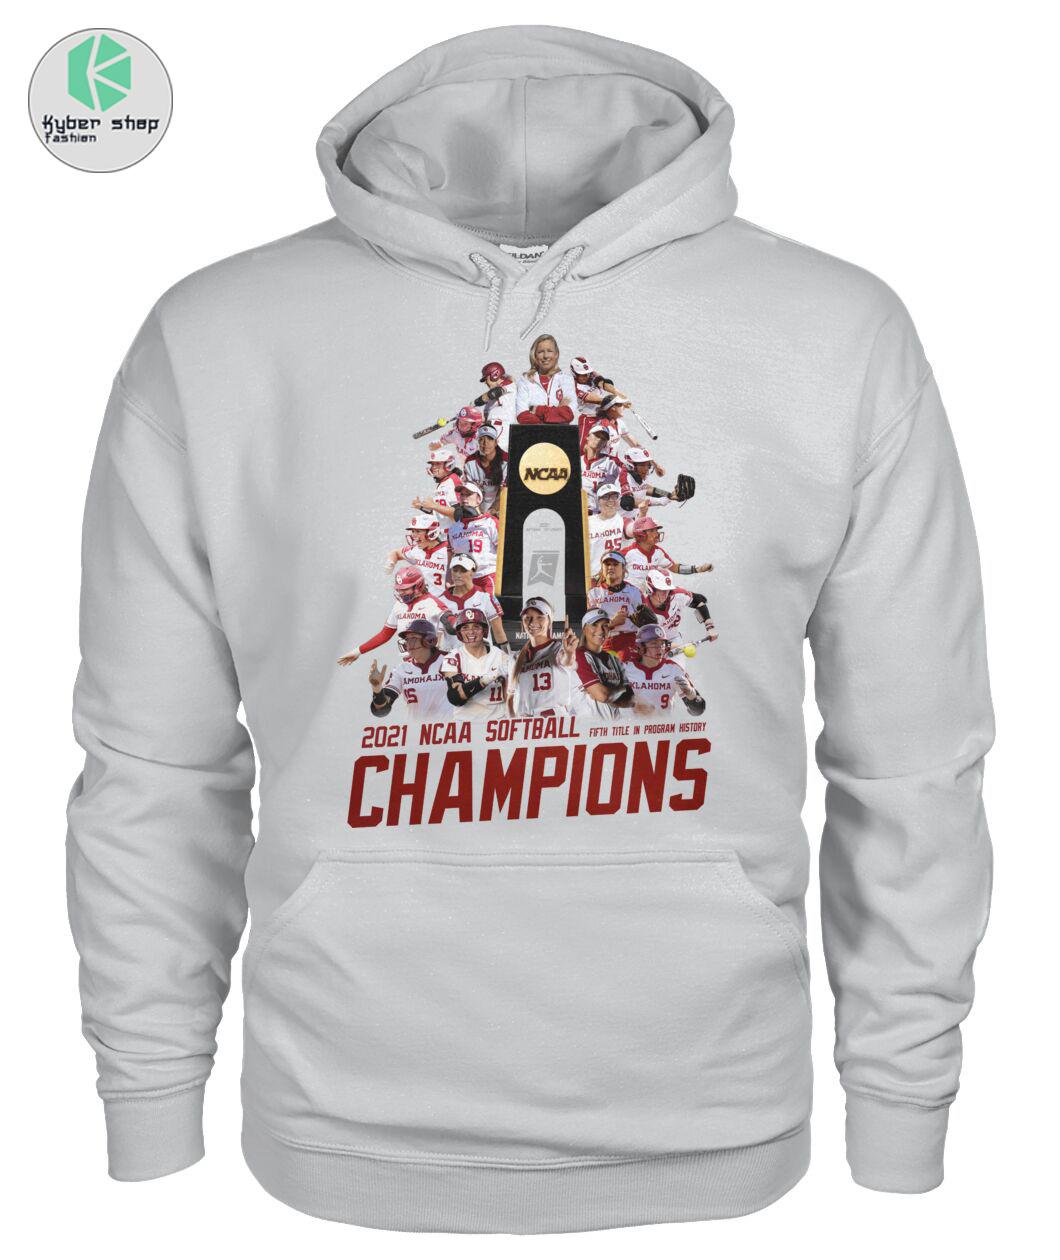 Oklahoma Sooners 2021 NCAA softball champions shirt 4